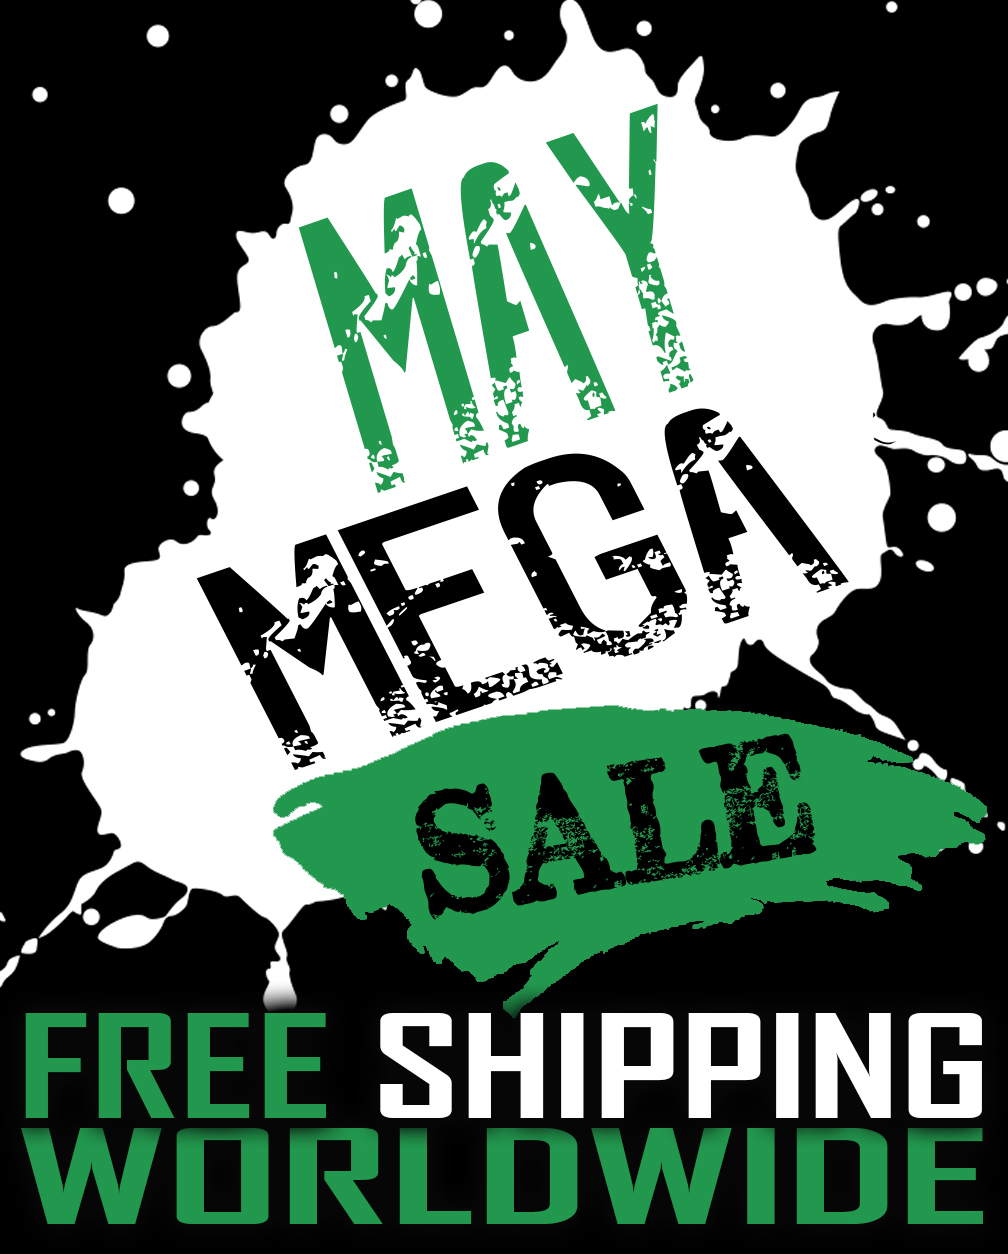 may-mega-sale-free-worldwide-shipping-new.jpg